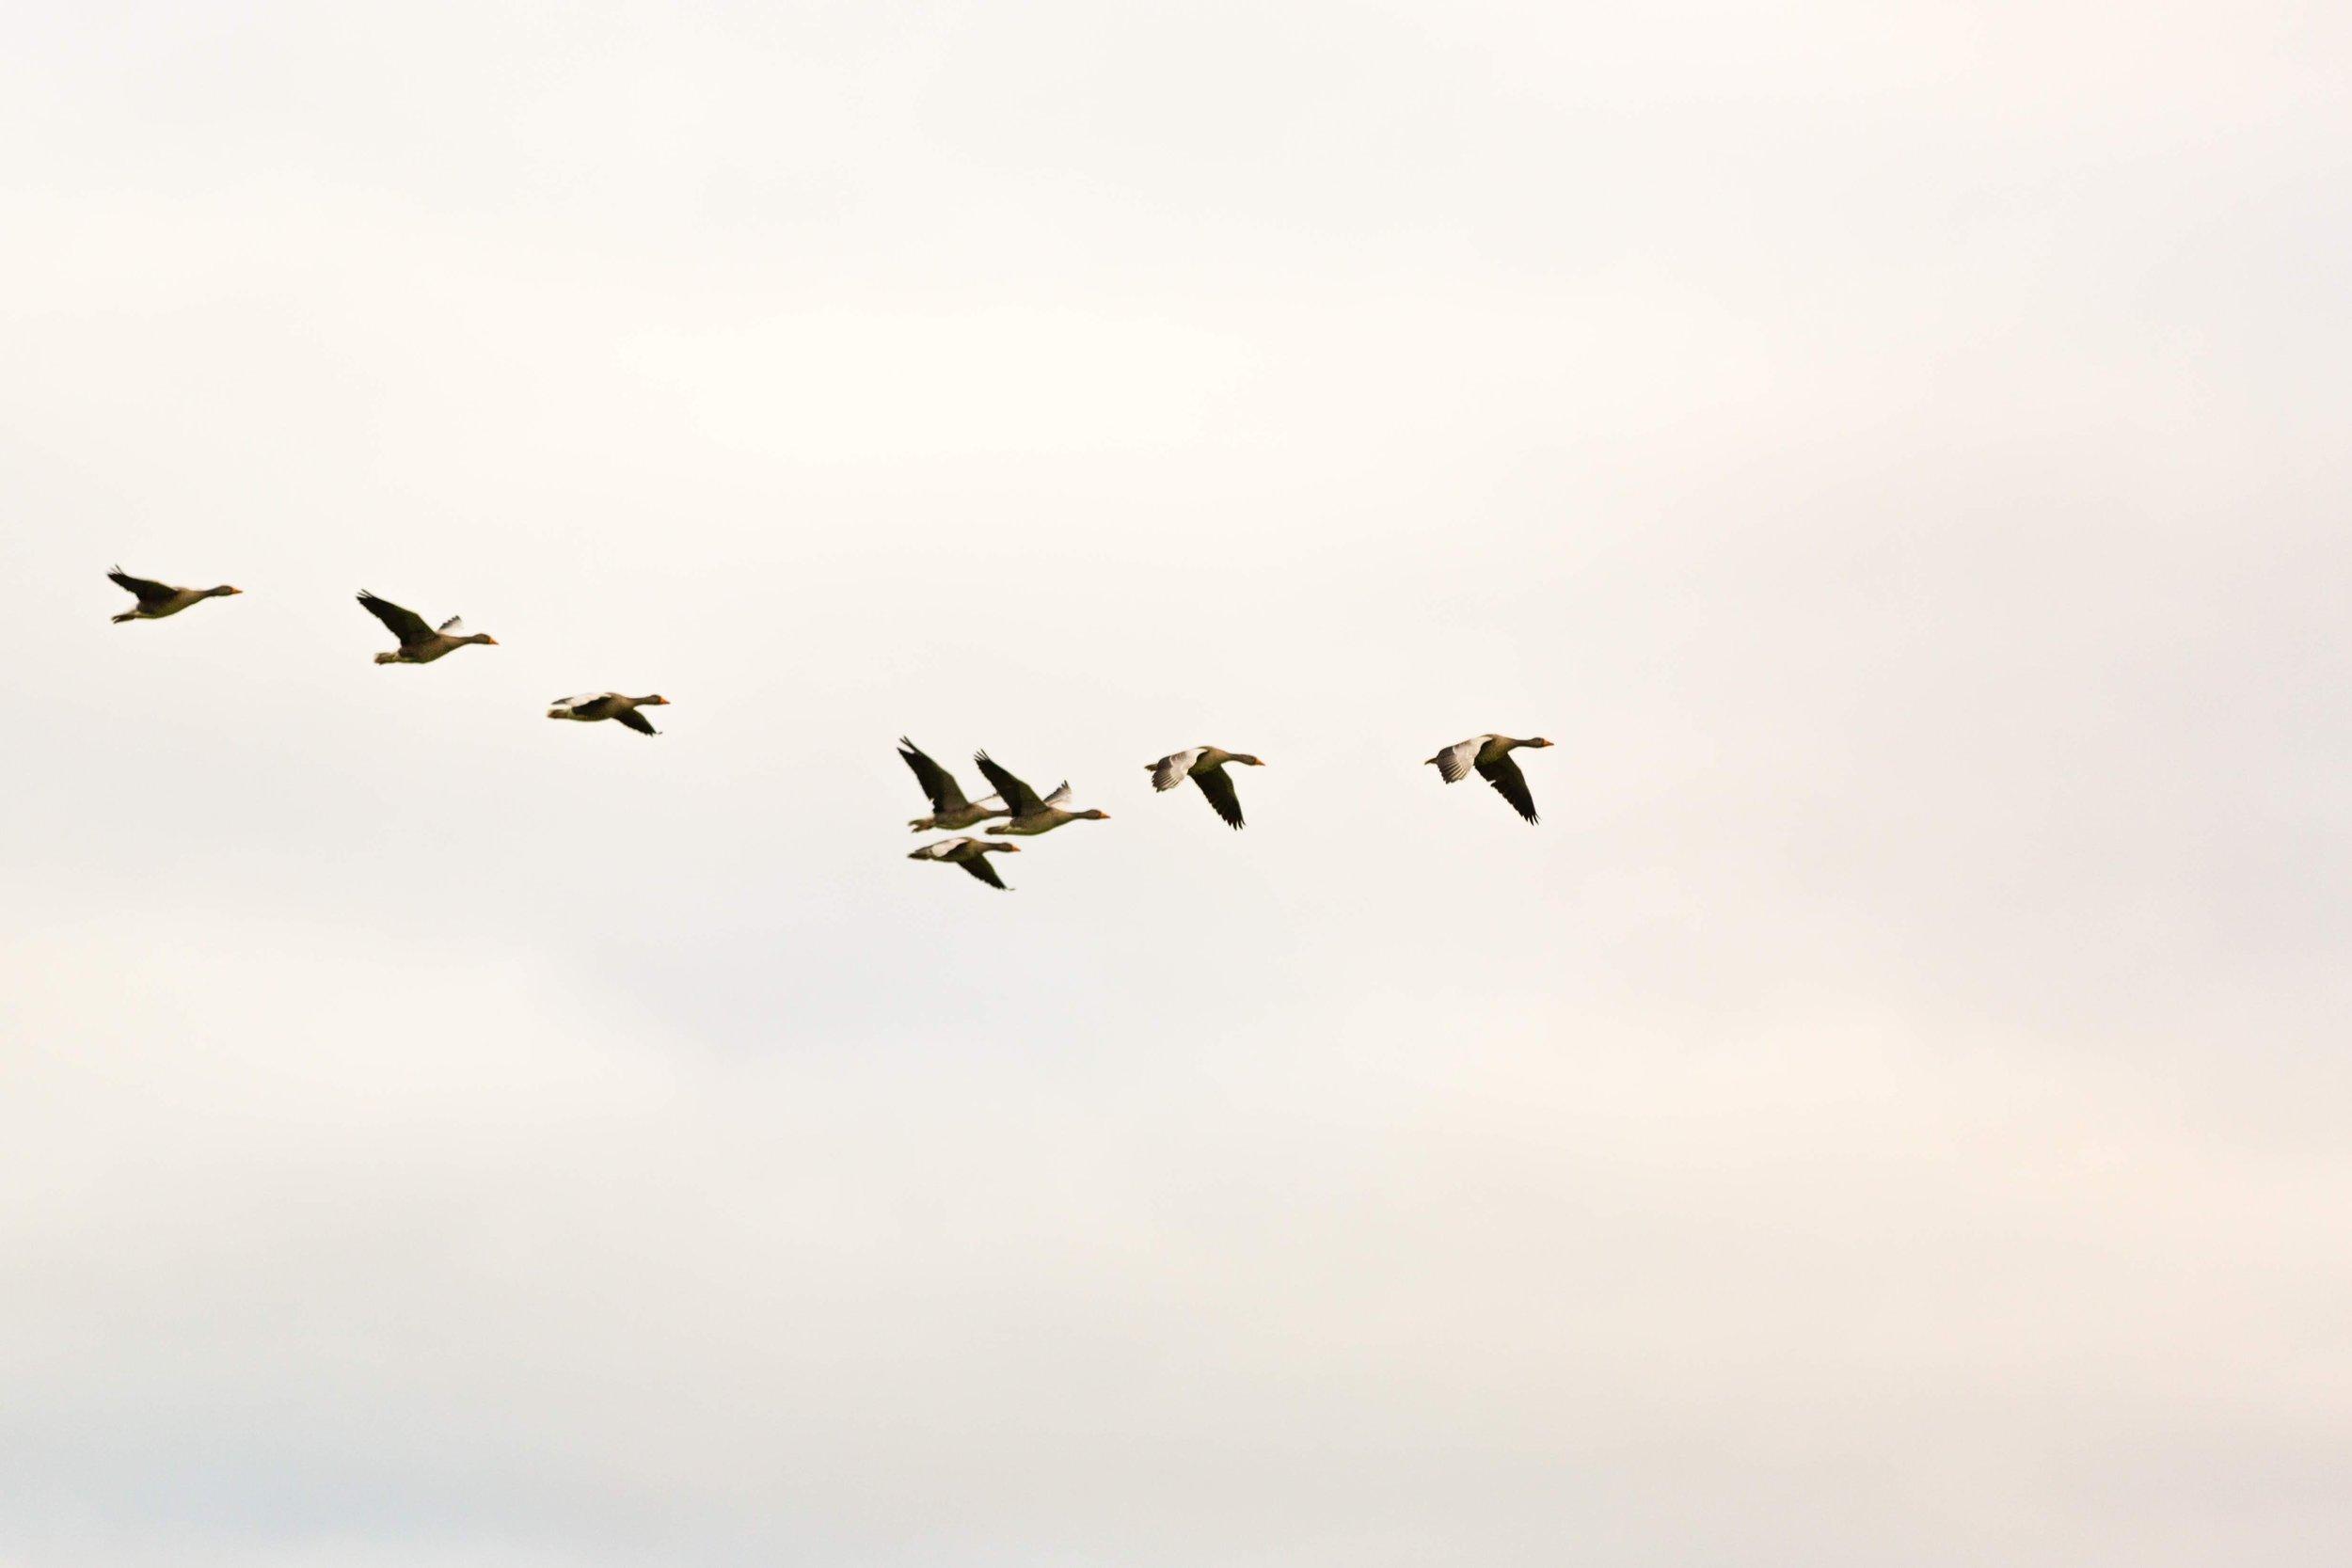 animal-animal-photography-flight-1721675.jpg